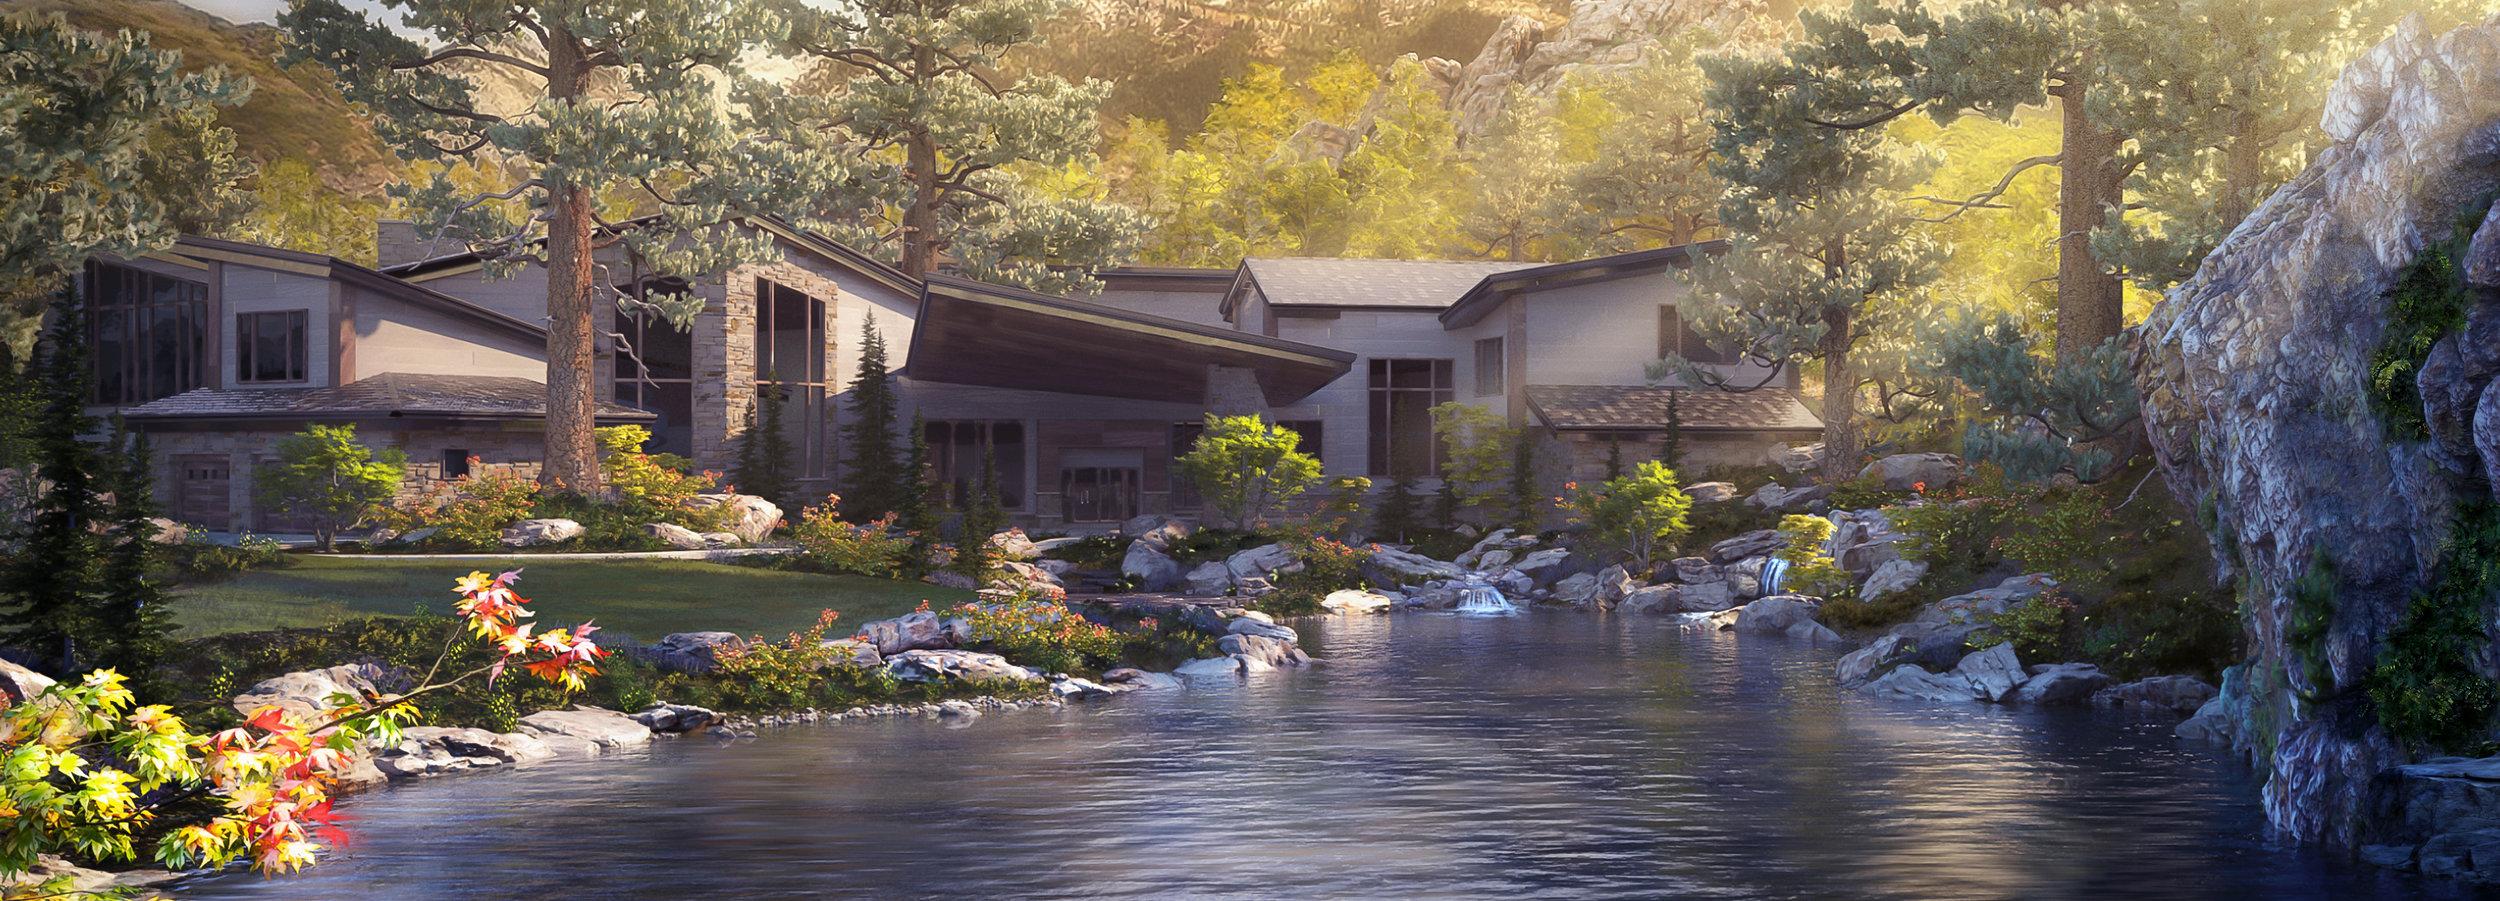 Mountain Home Landscape.jpg